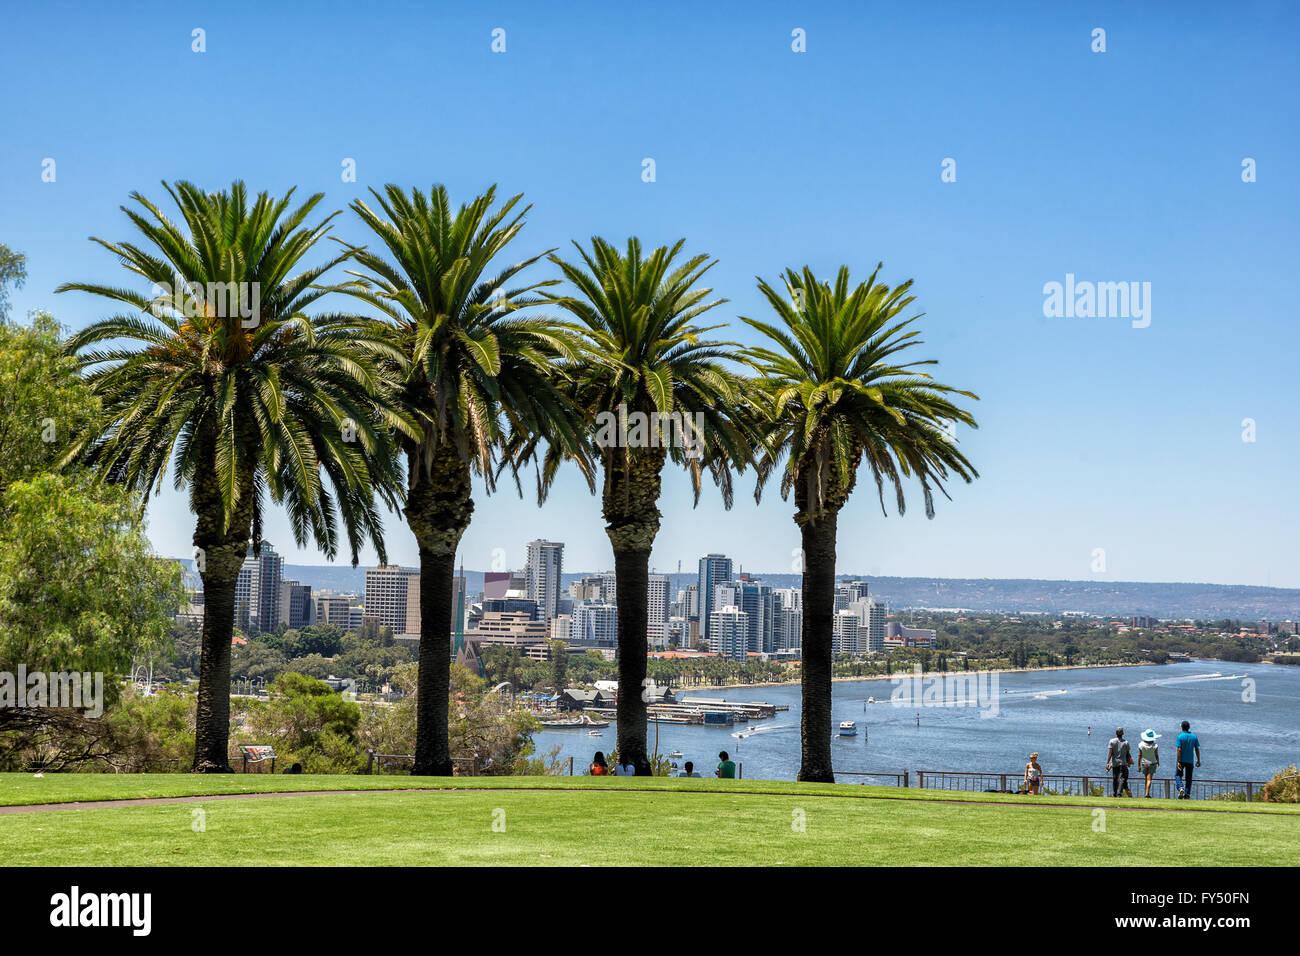 Kings Park in Perth - Stock Image